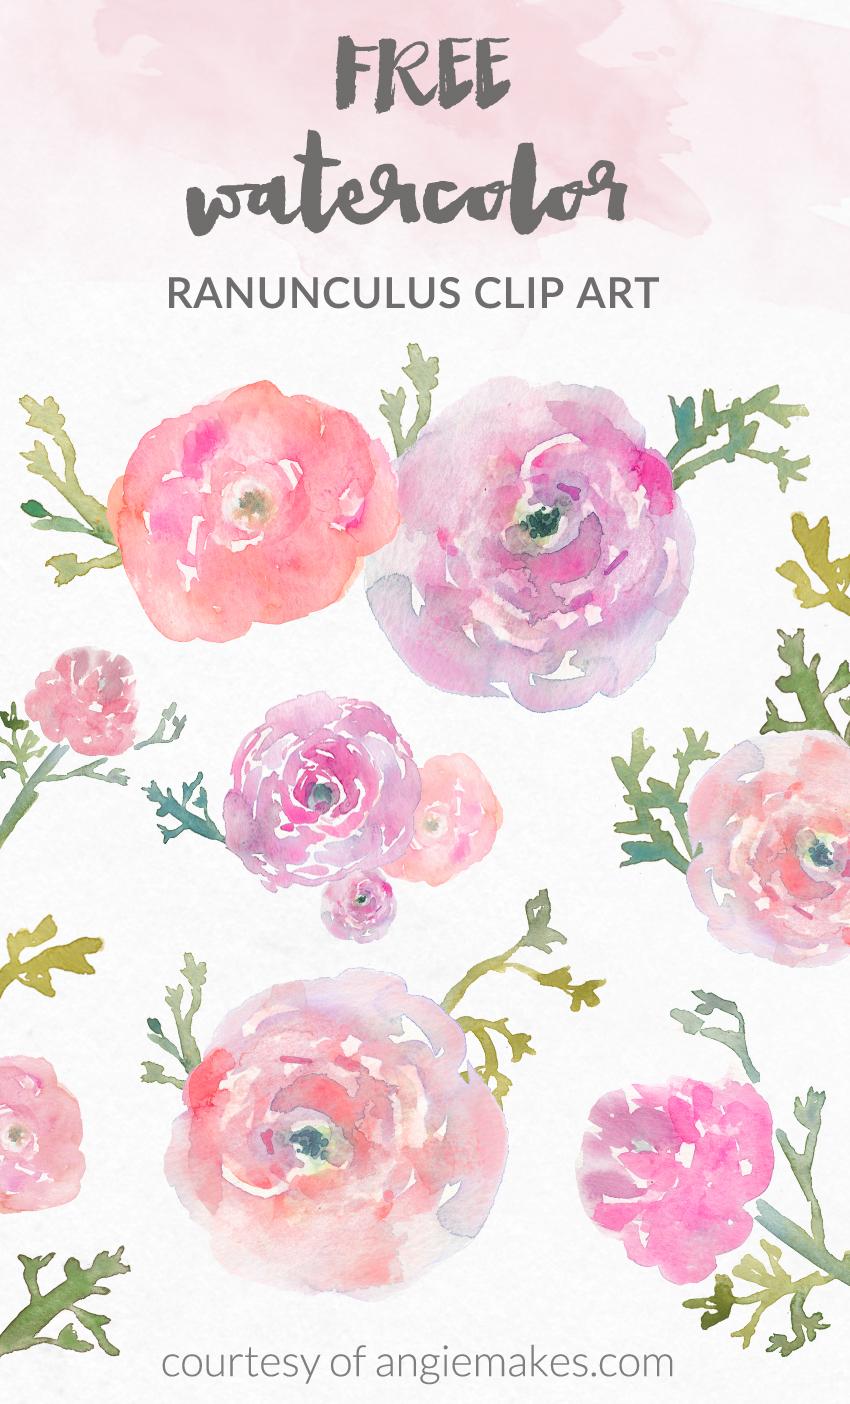 Floral clipart ranunculus Watercolor Flower Angie Clip Art